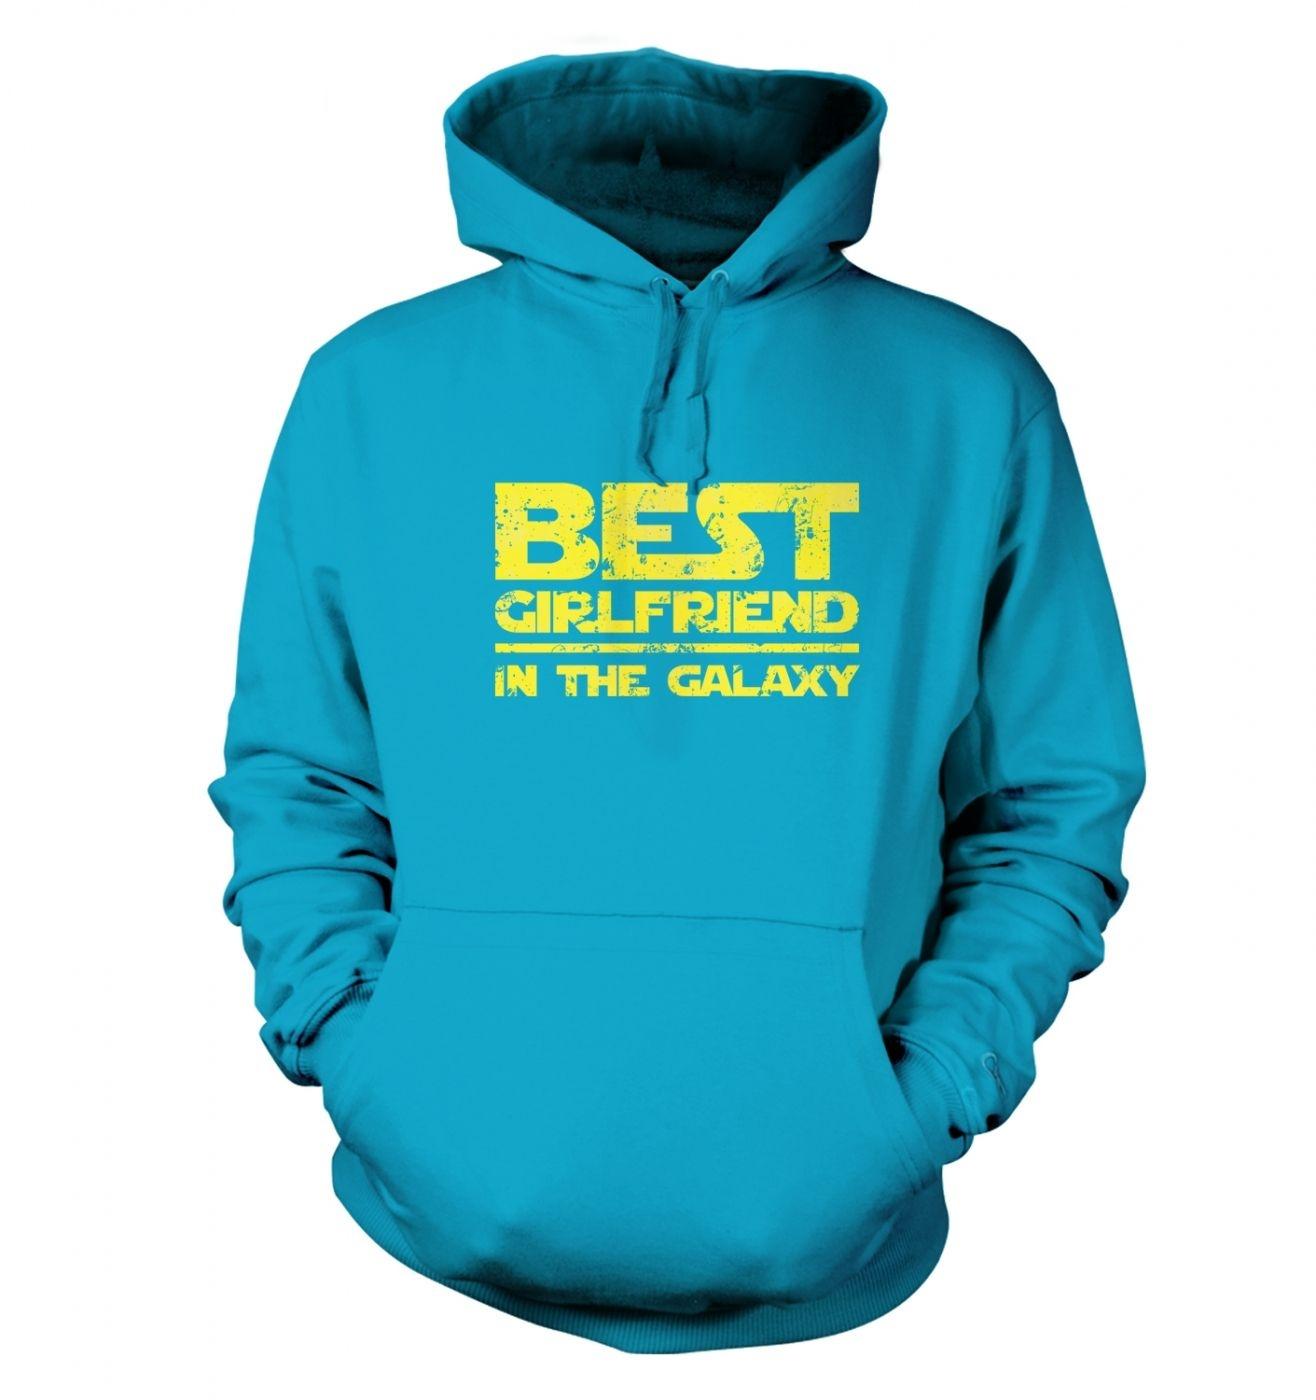 Best Girlfriend In The Galaxy adults' hoodie